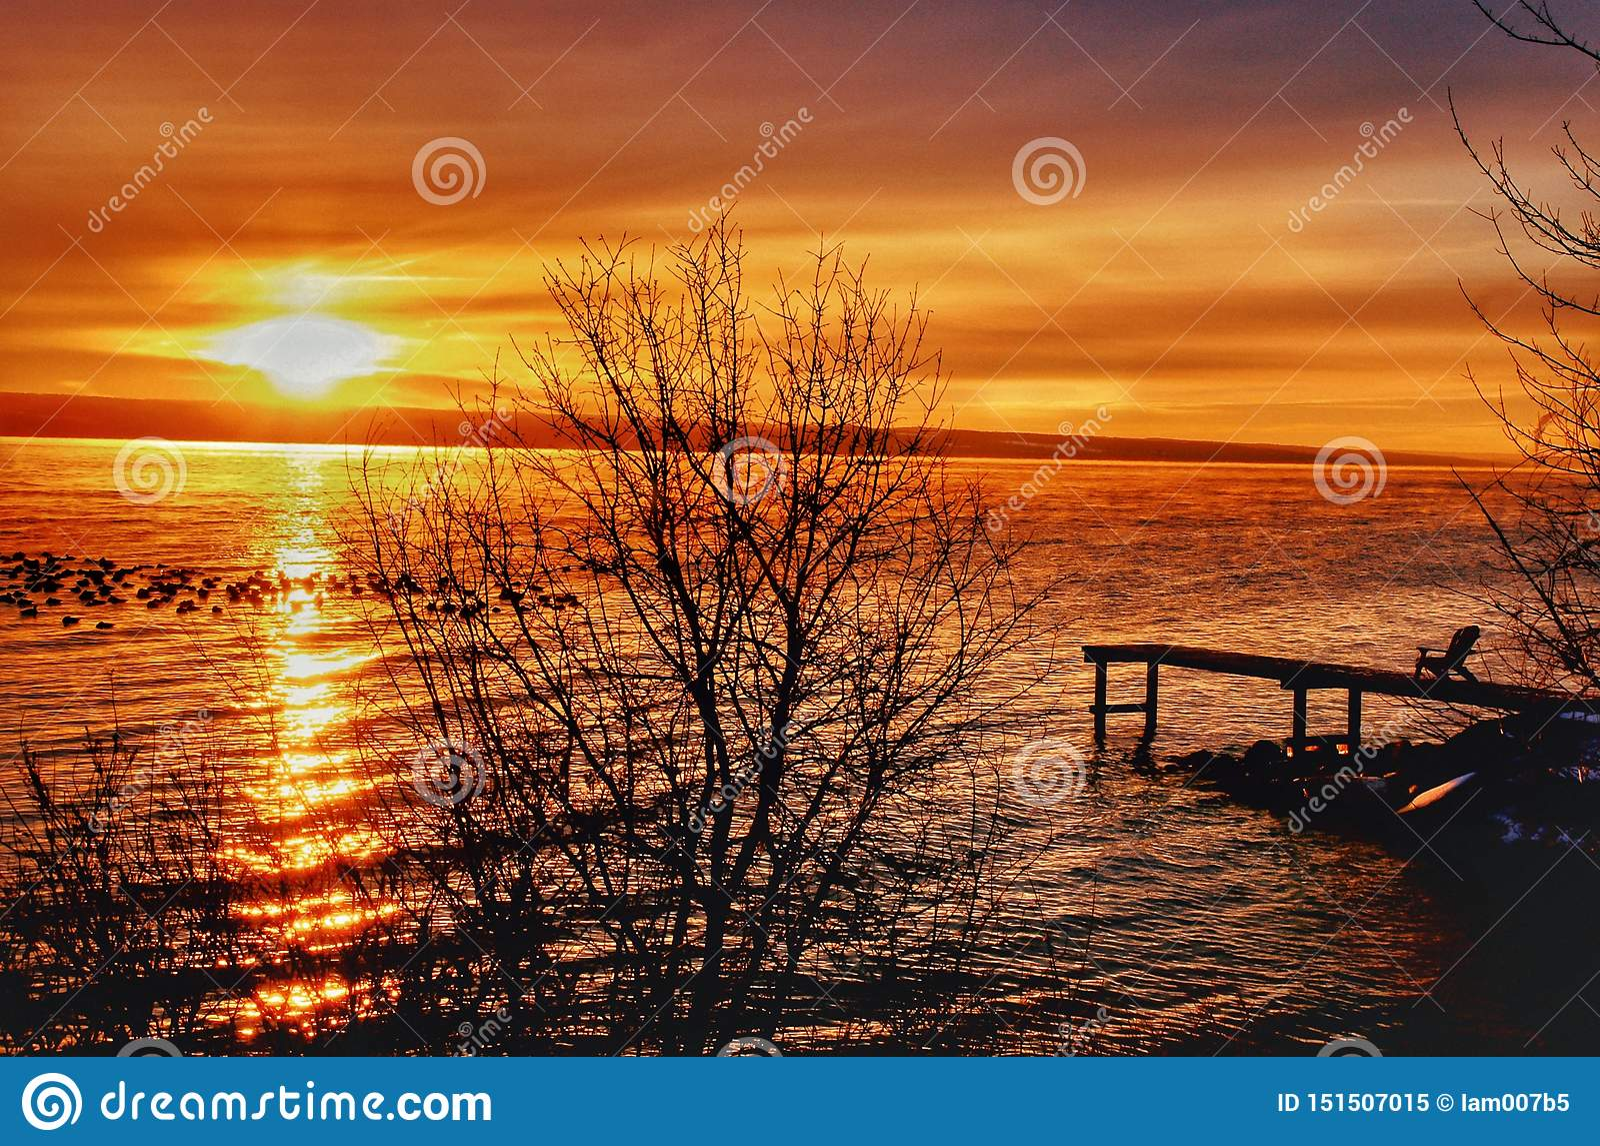 MAGNIFICENT LAKE SUMMER SUNSET ON HORIZON